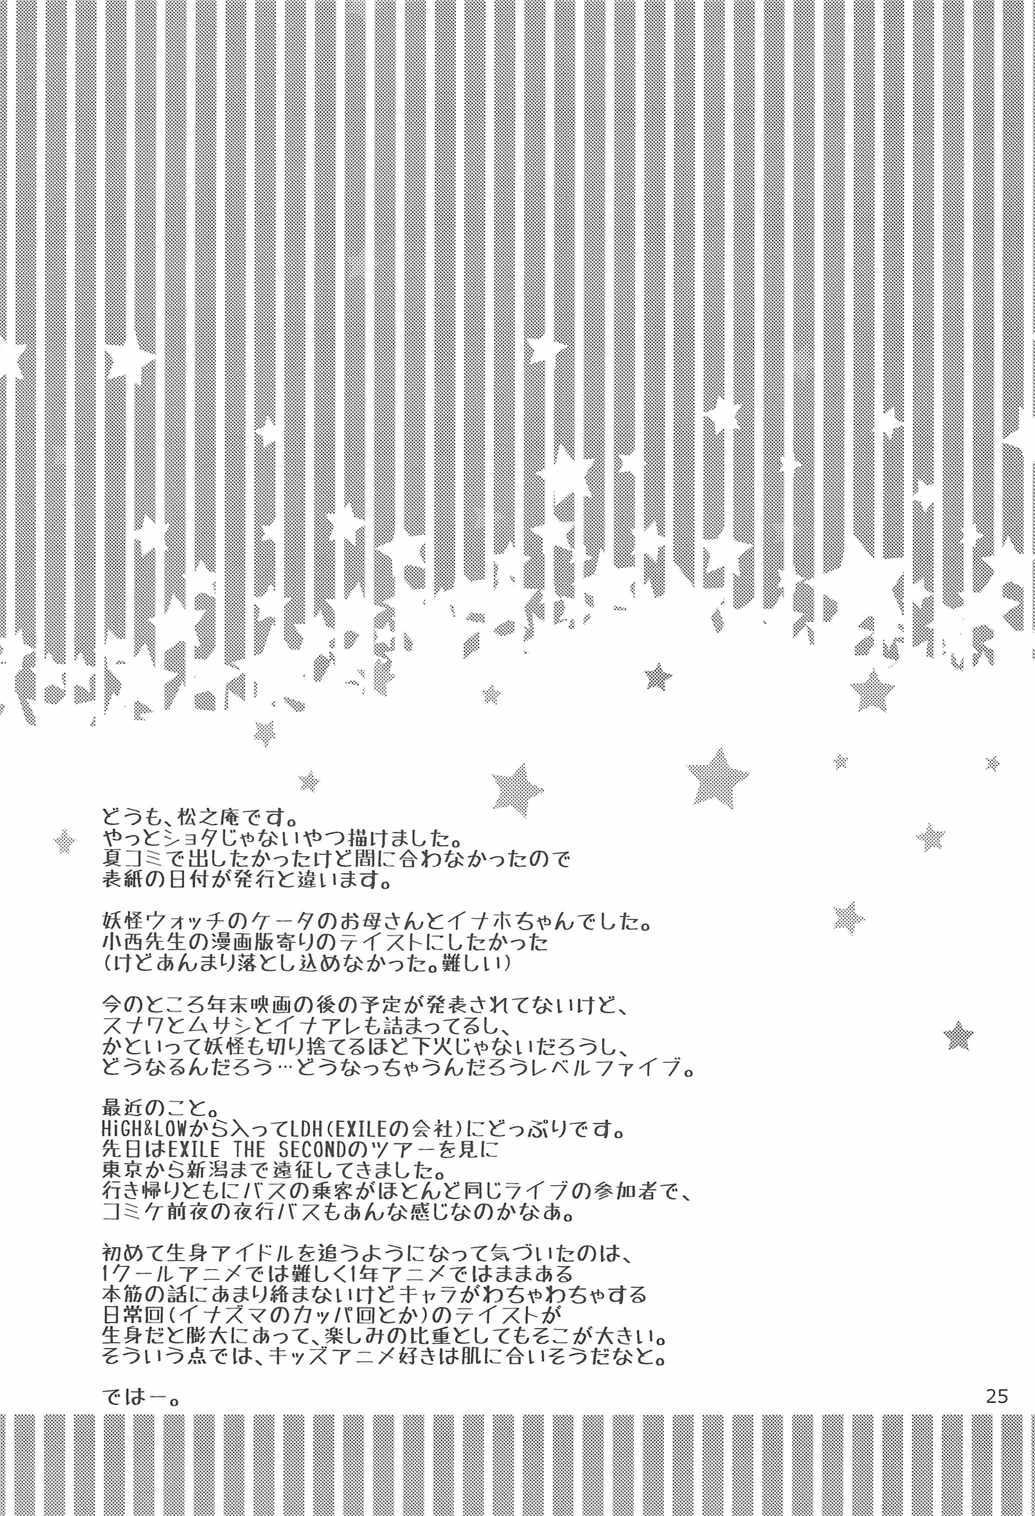 Fushouji Oyako to Shoujo no Otanoshimi da nyan!   It's Some Married Mother on Son and Solo Girl action-nyan! 25